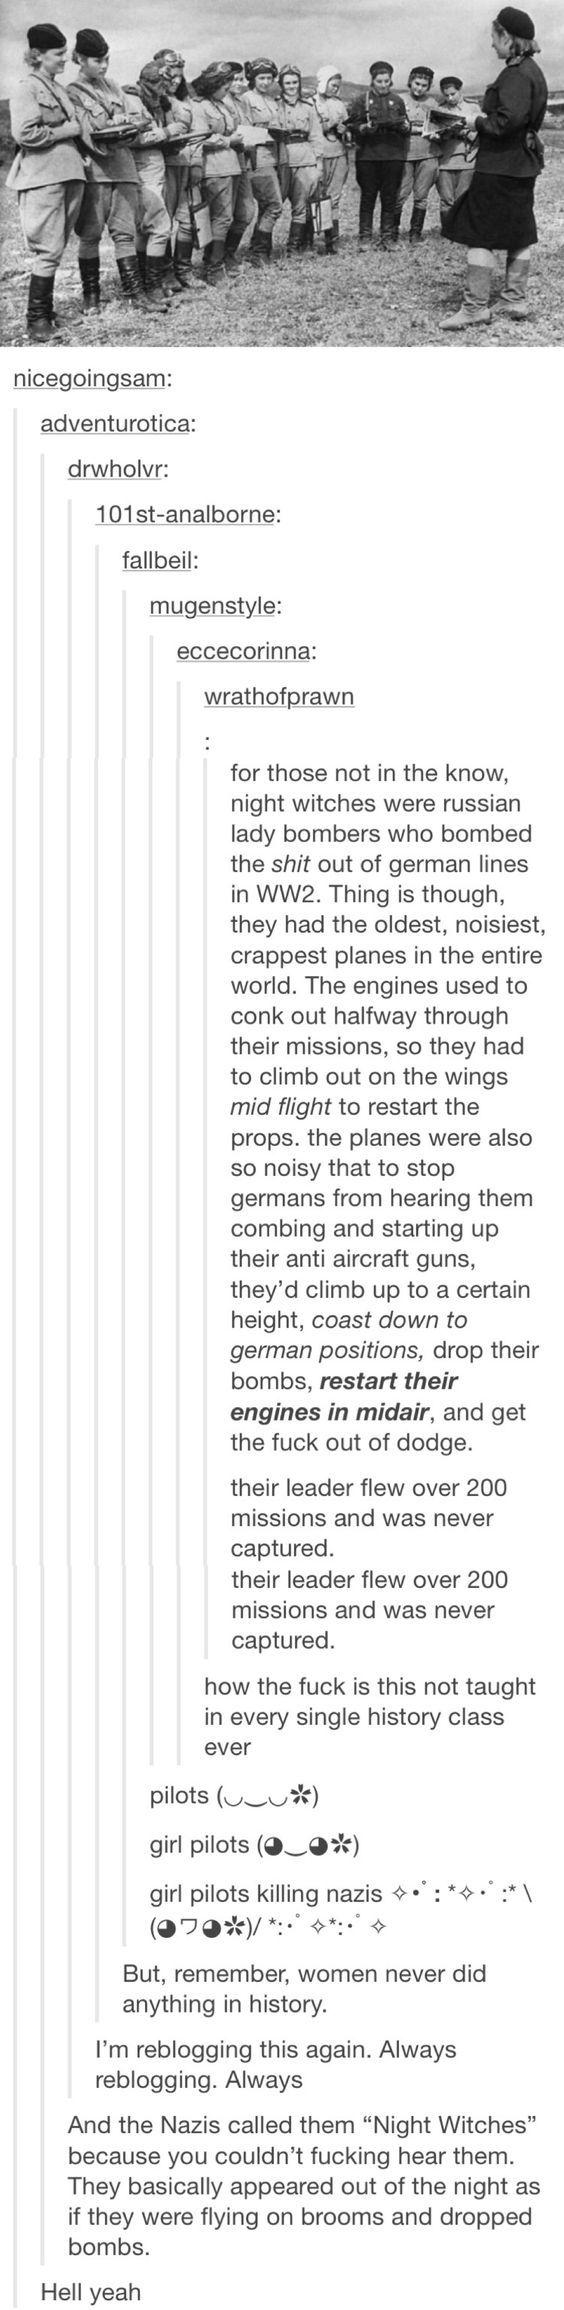 Badassery from WWII